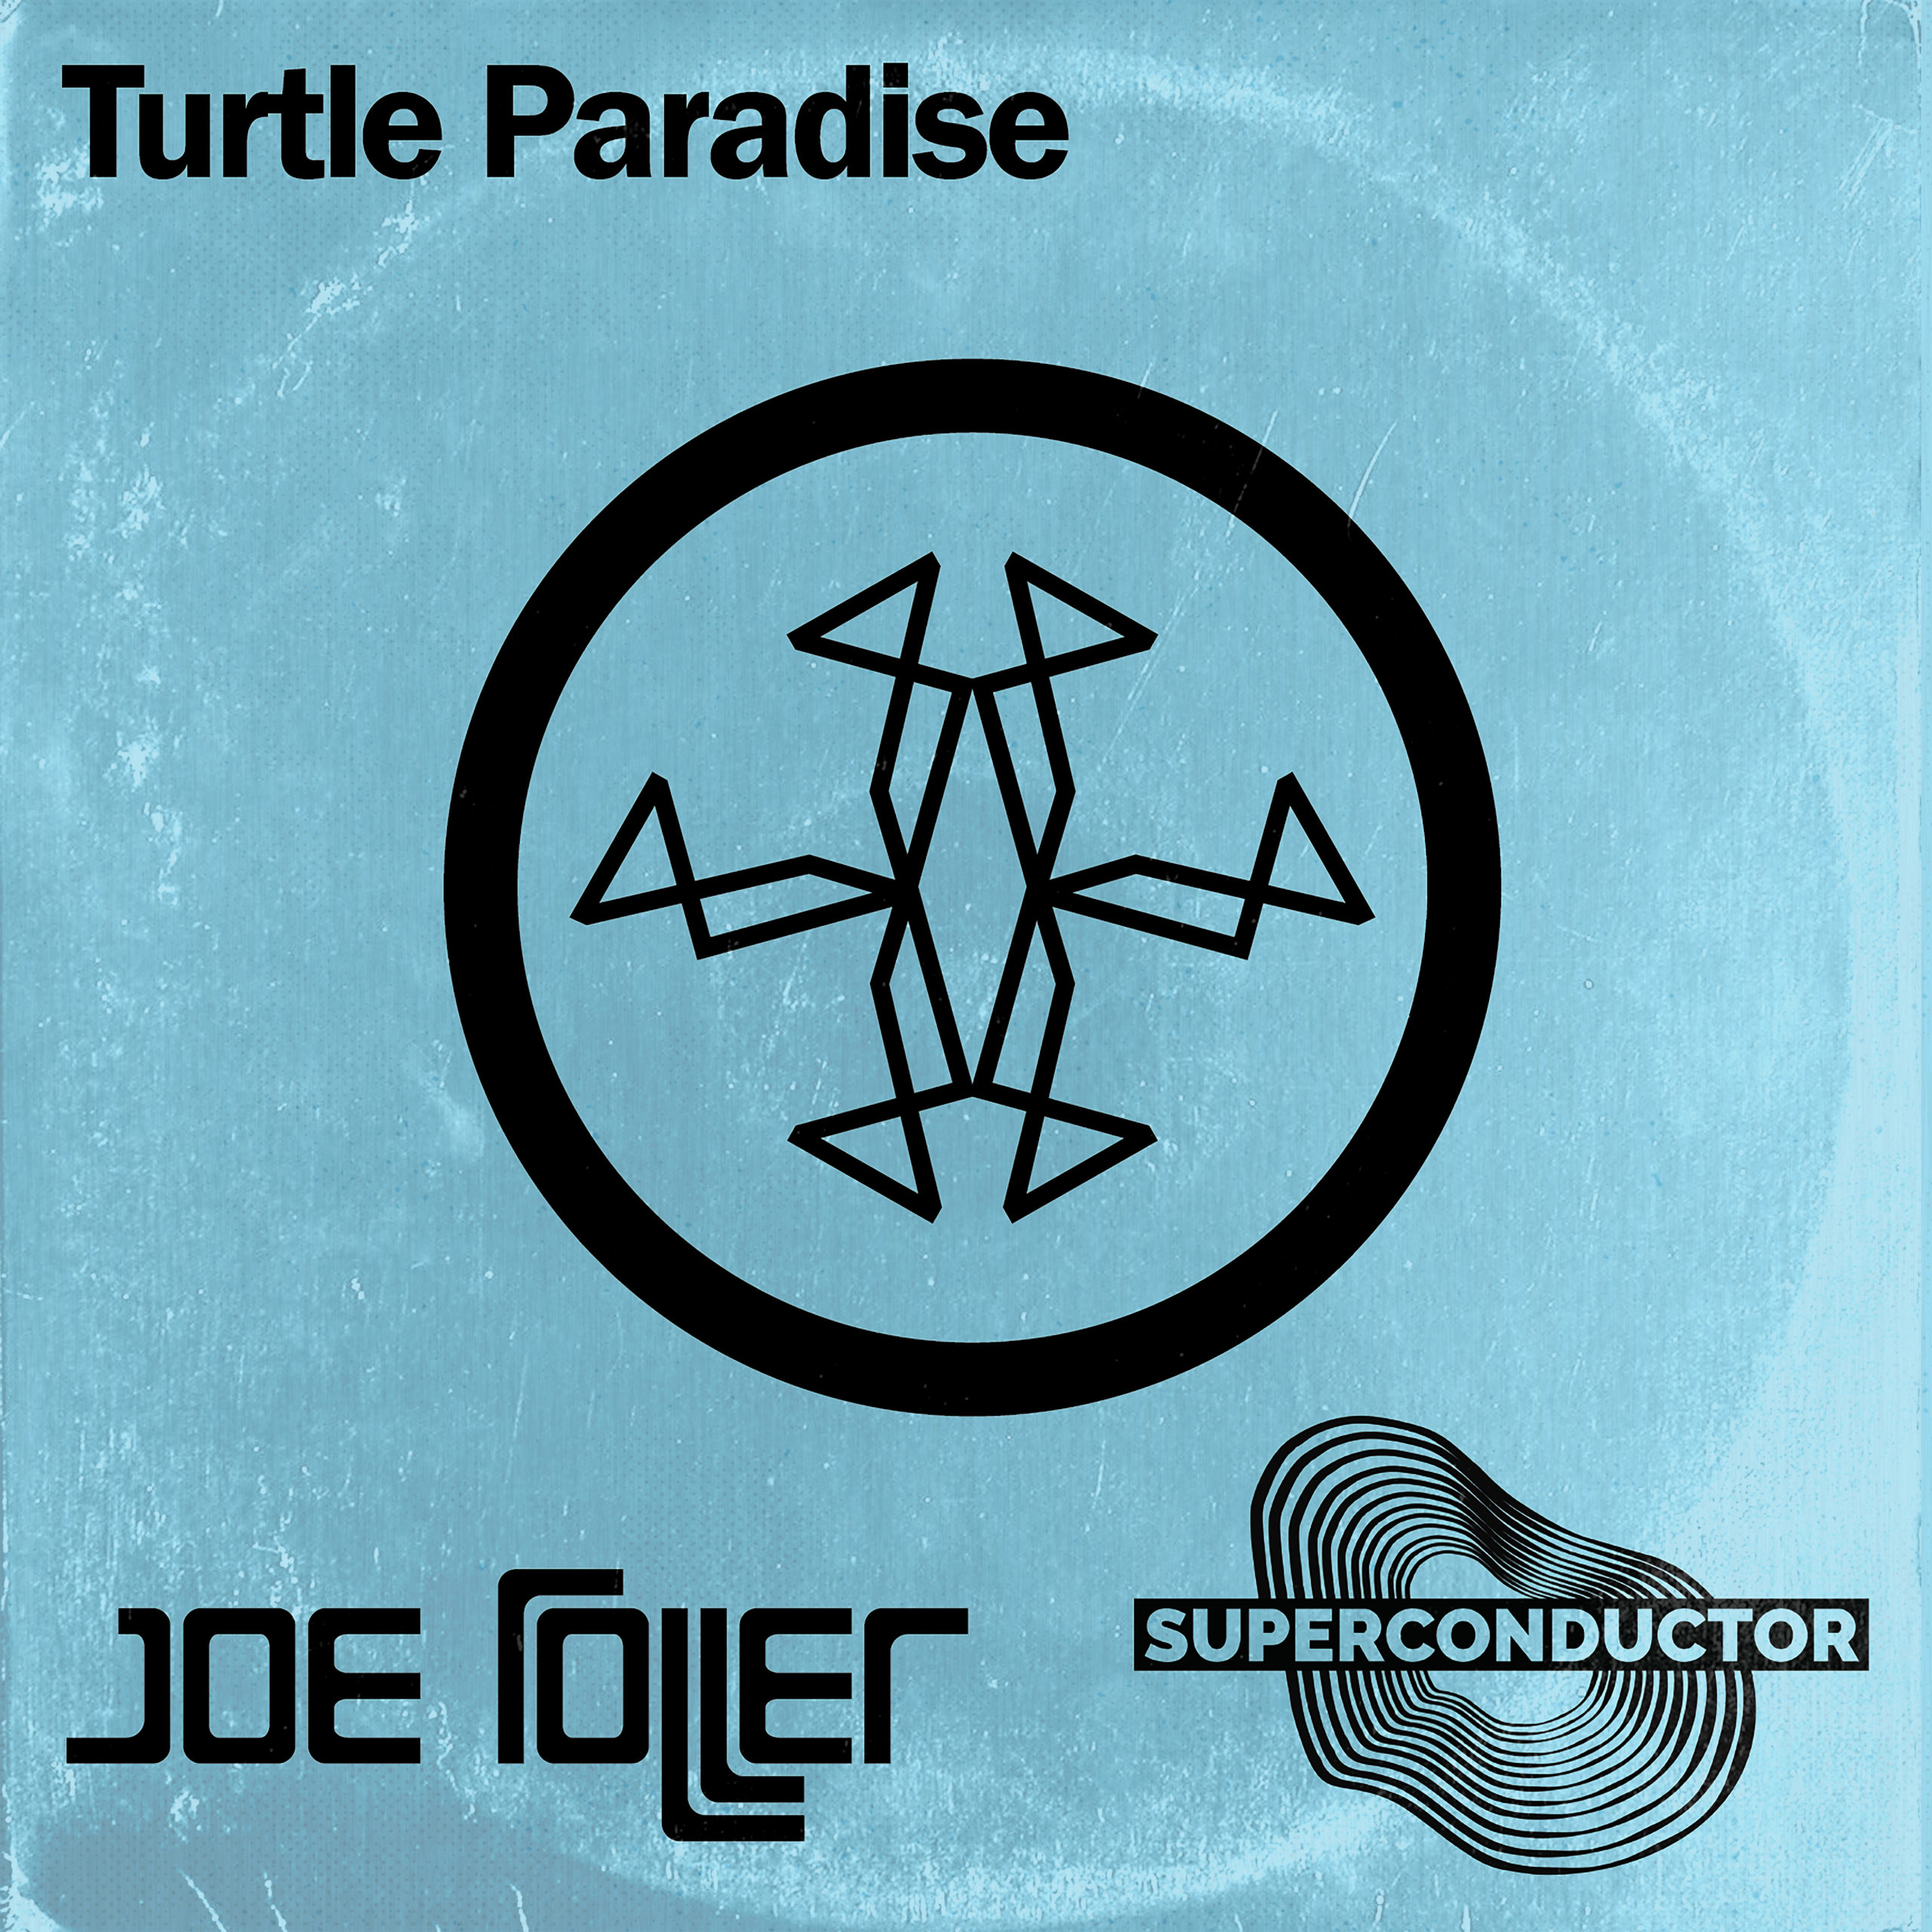 Joe Roller, Superconductor - Turtle Paradise Art